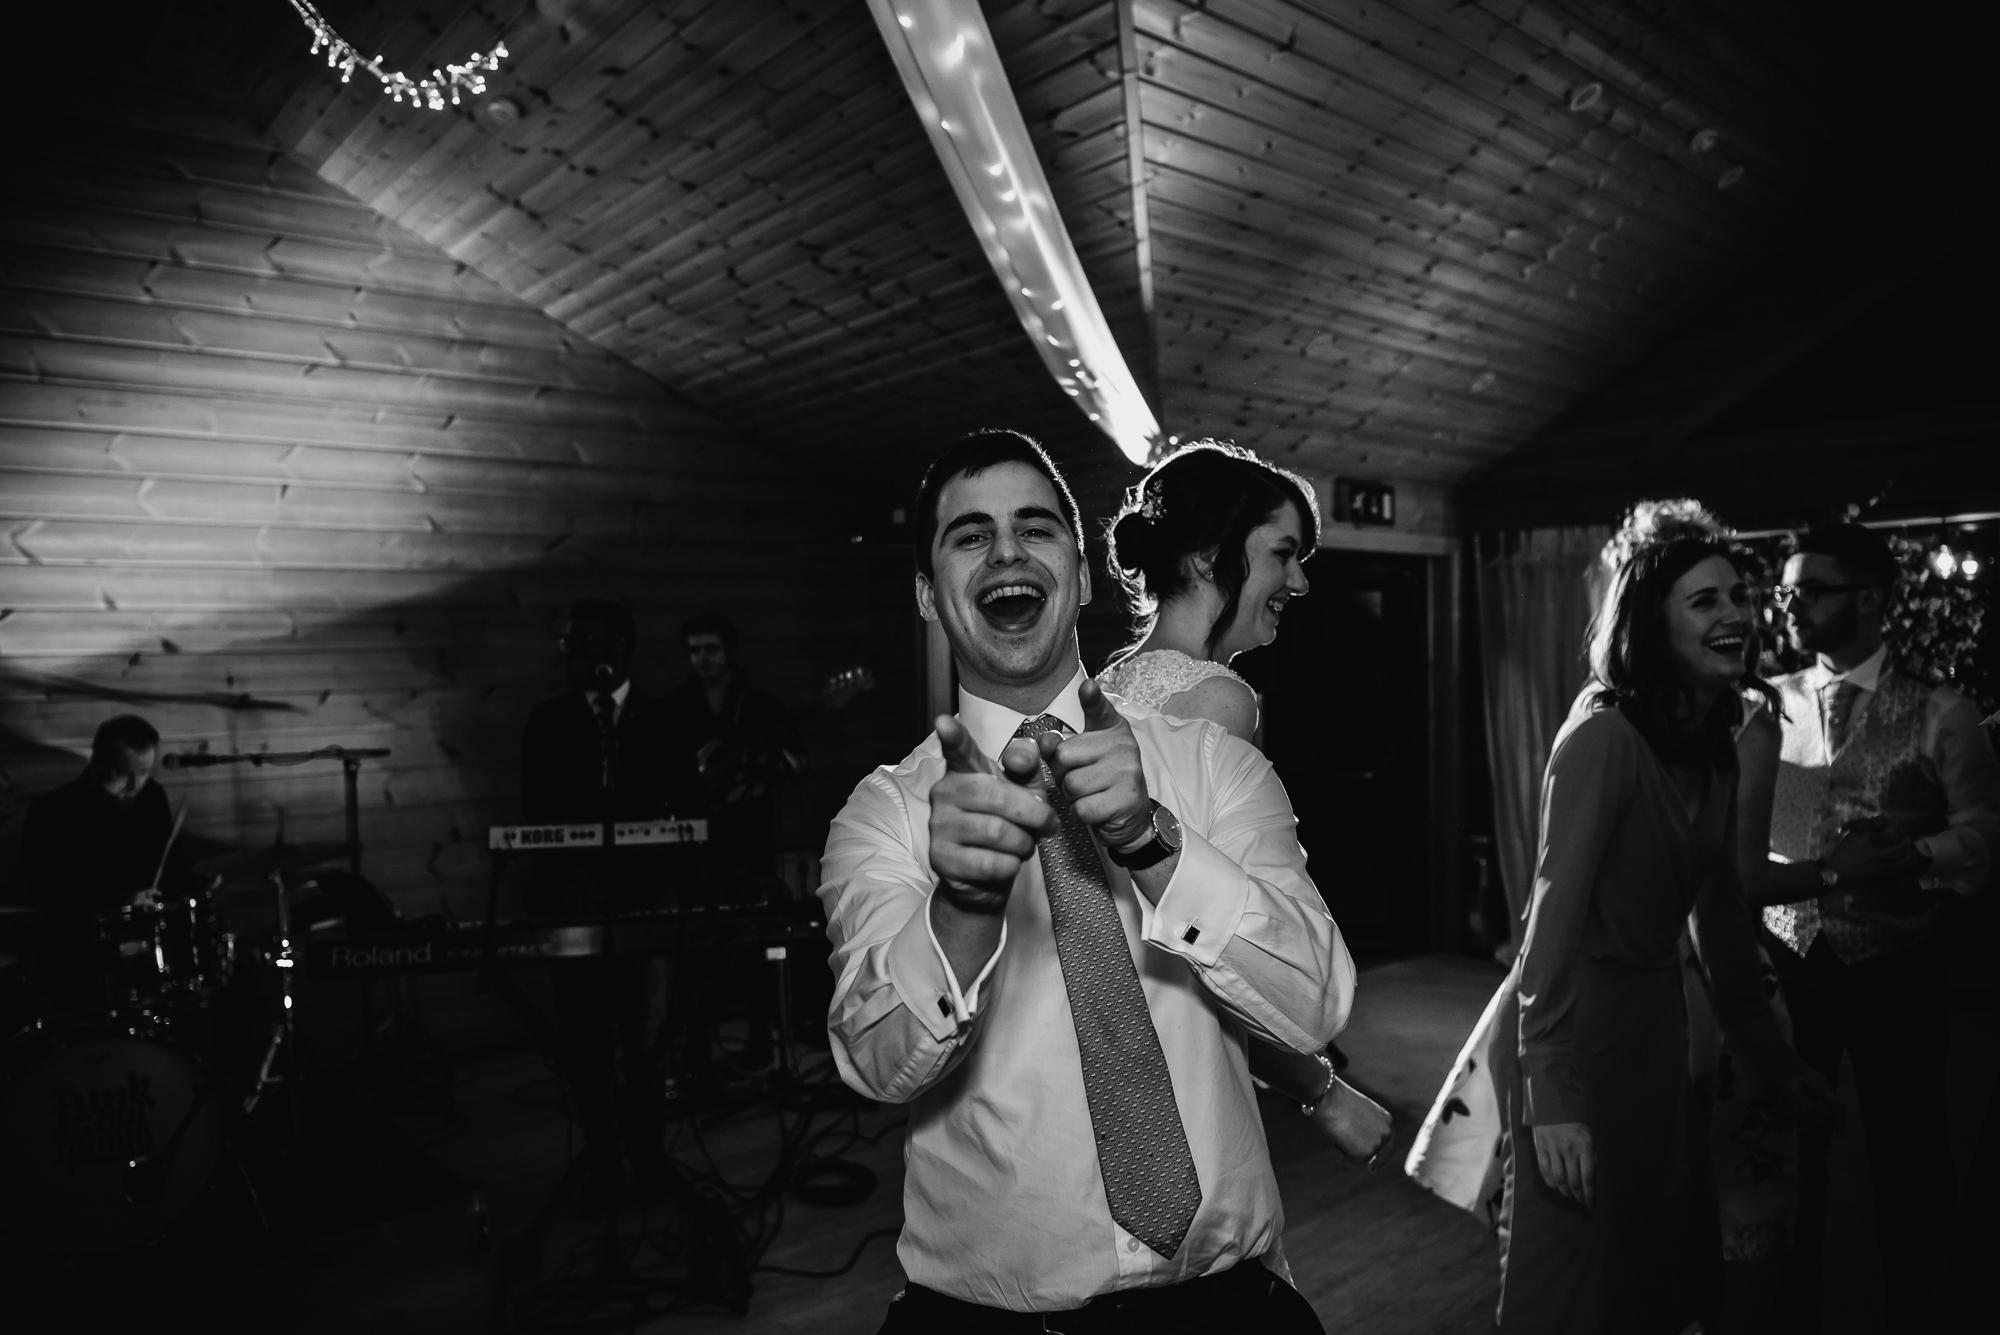 Beeston Manor Wedding Photographer based in cheshire covering Lancashire weddings and surounding areas of the northwest uk (5 of 6).jpg